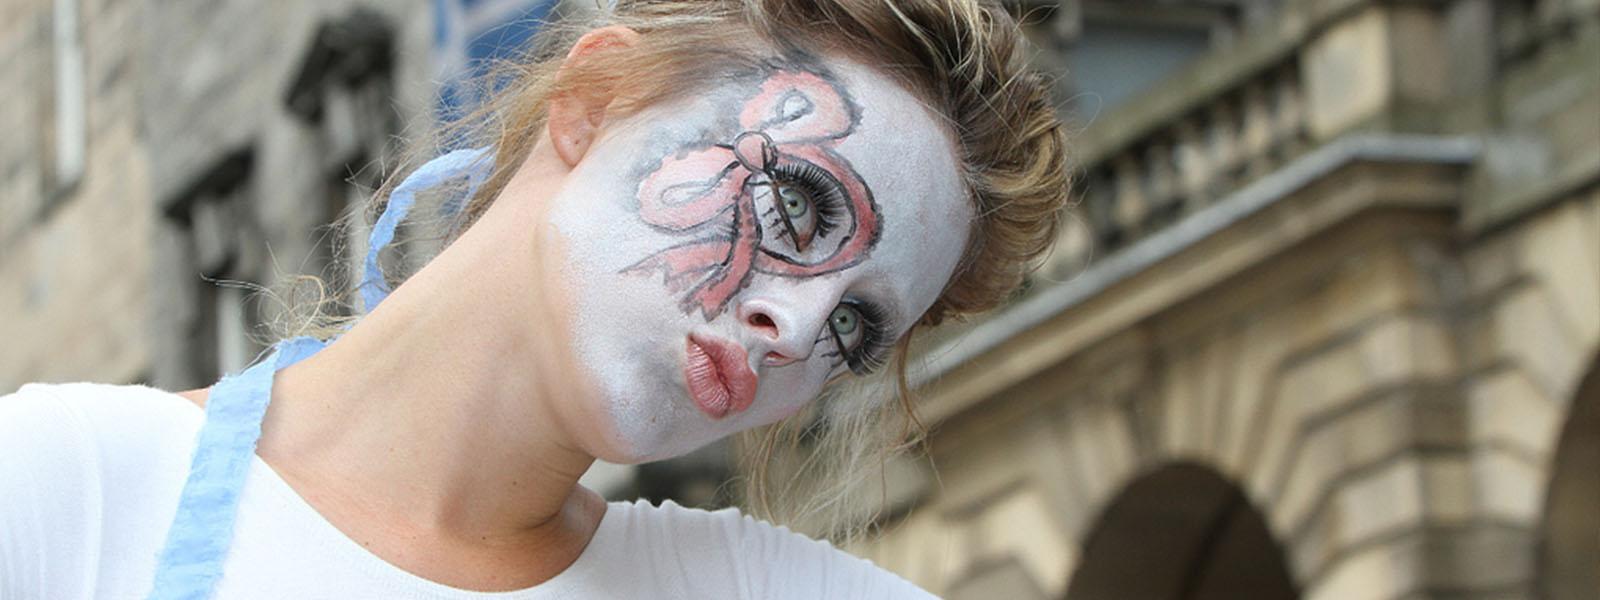 Actress at the Edinburgh Fringe